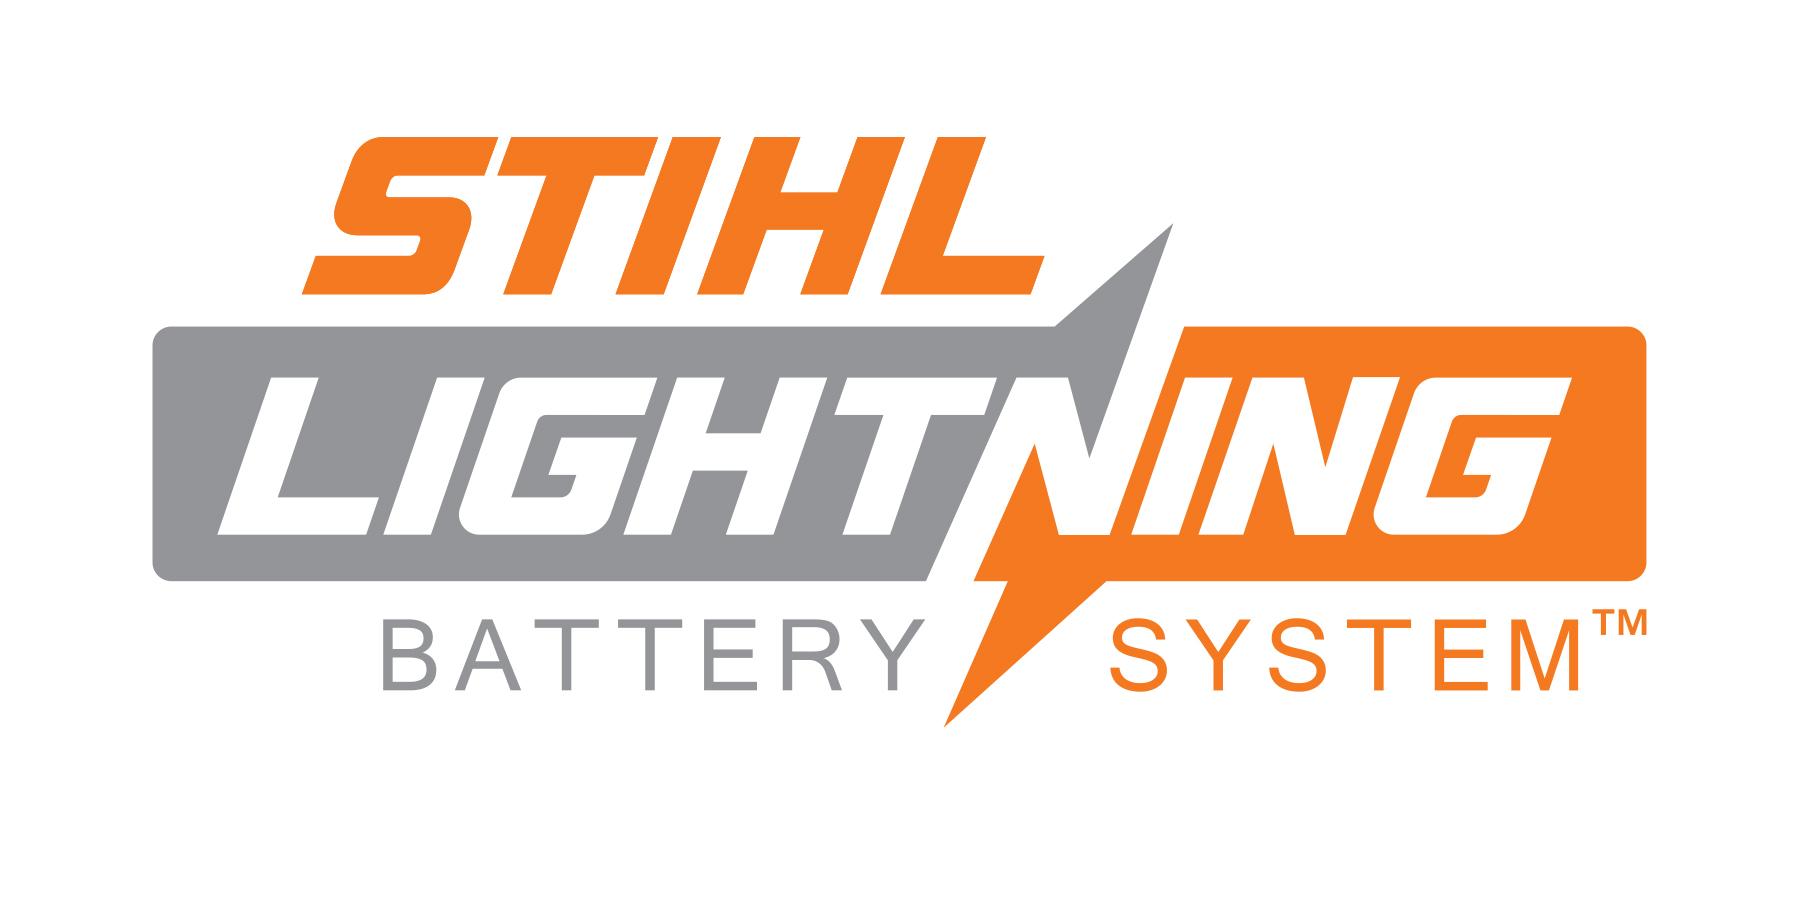 STIHLlightningLogo_TM_2C.jpg